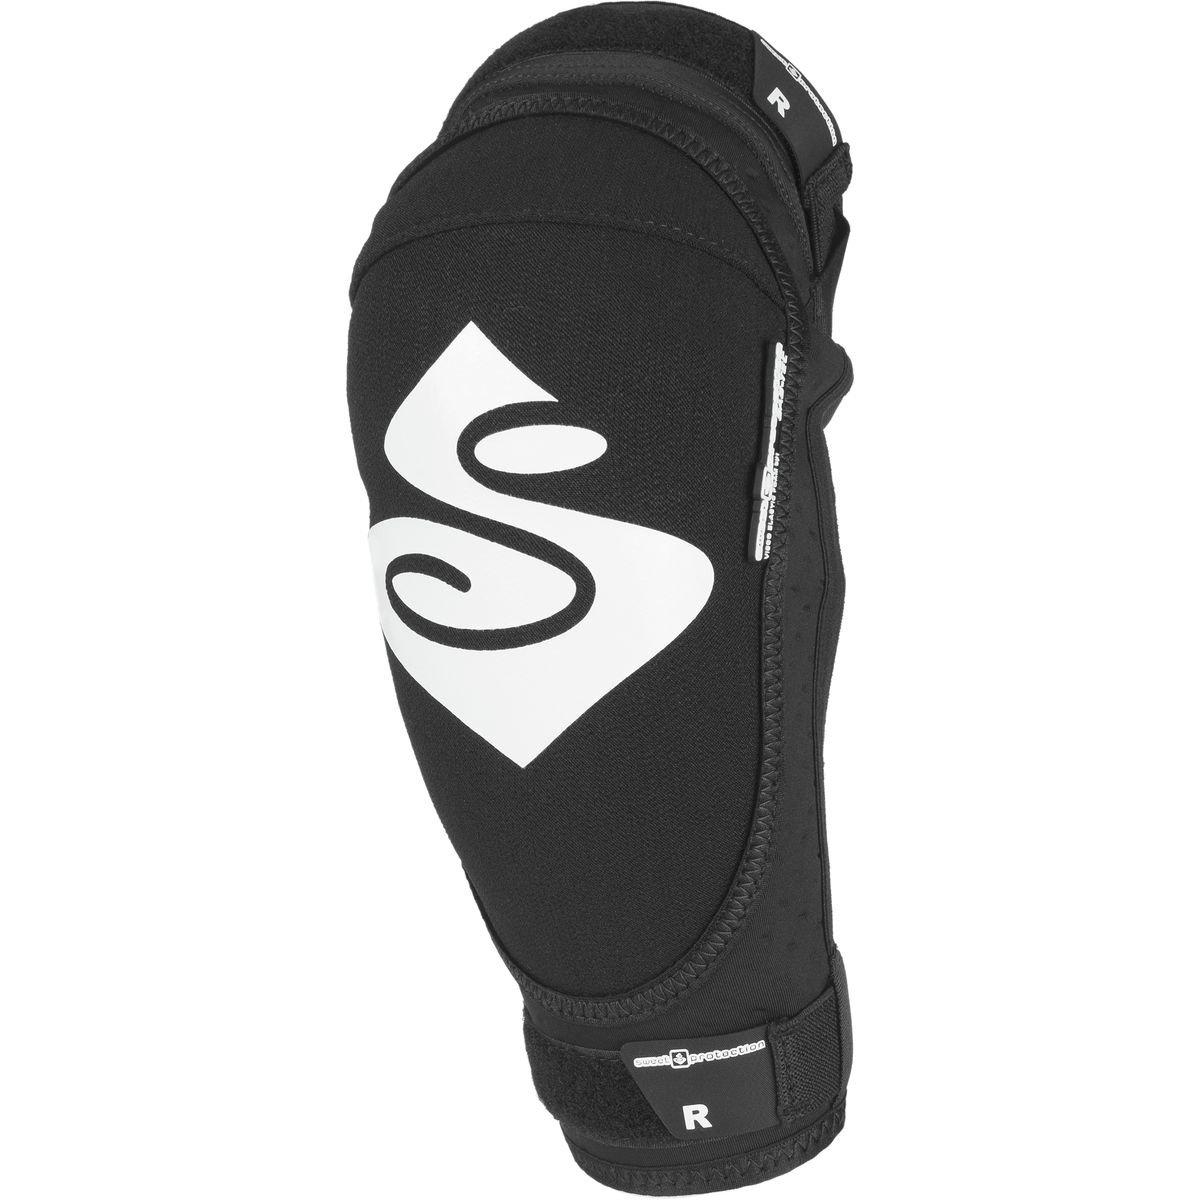 Sweet保護Bearsuit Elbow Pads Medium ブラック(True Black) B06Y4F166X